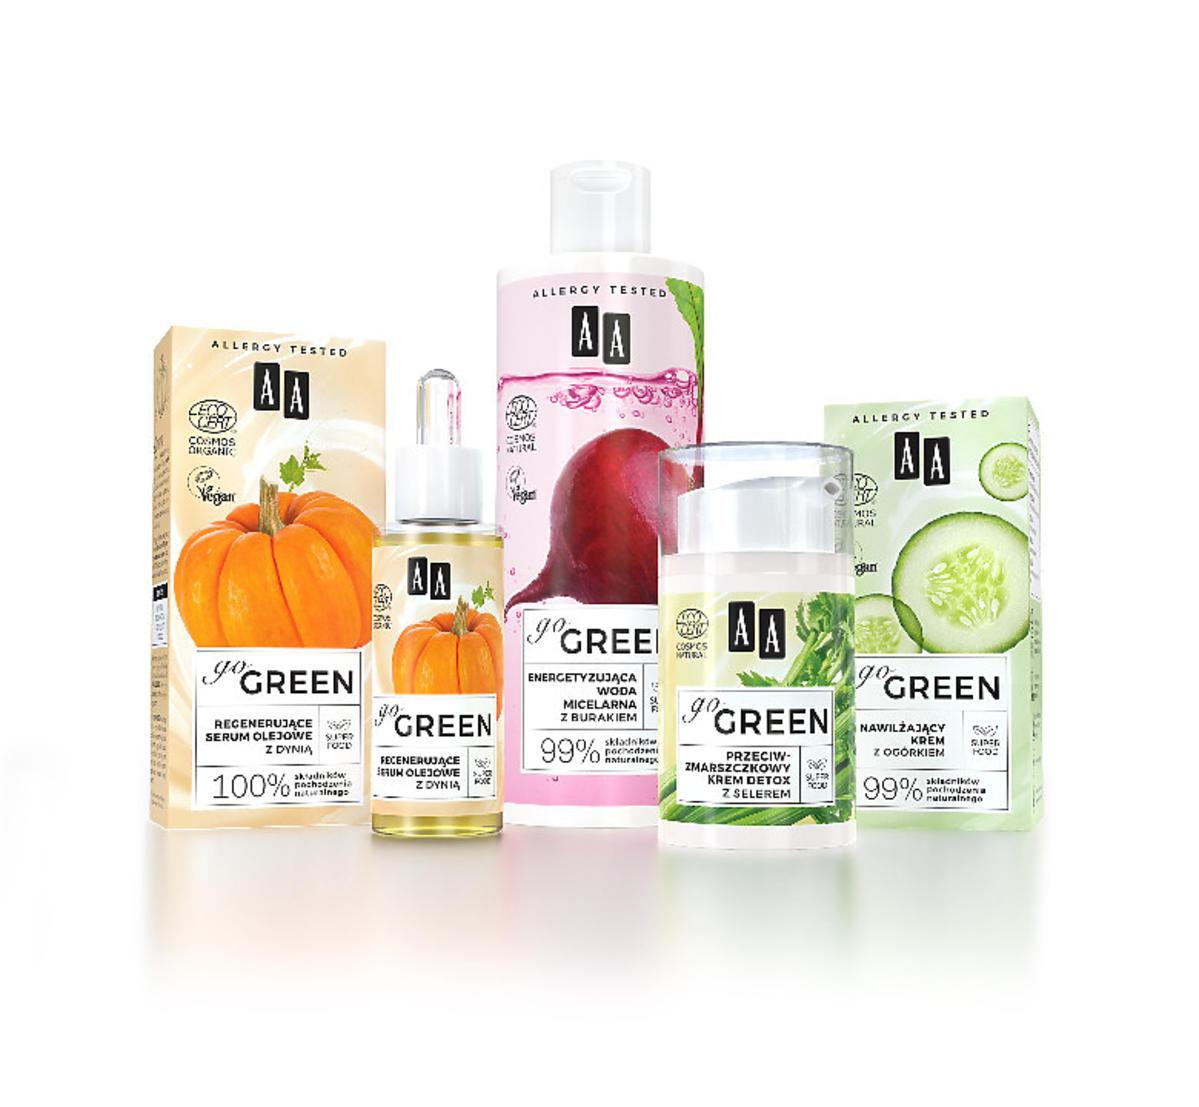 kosmetyki-aa-go-green